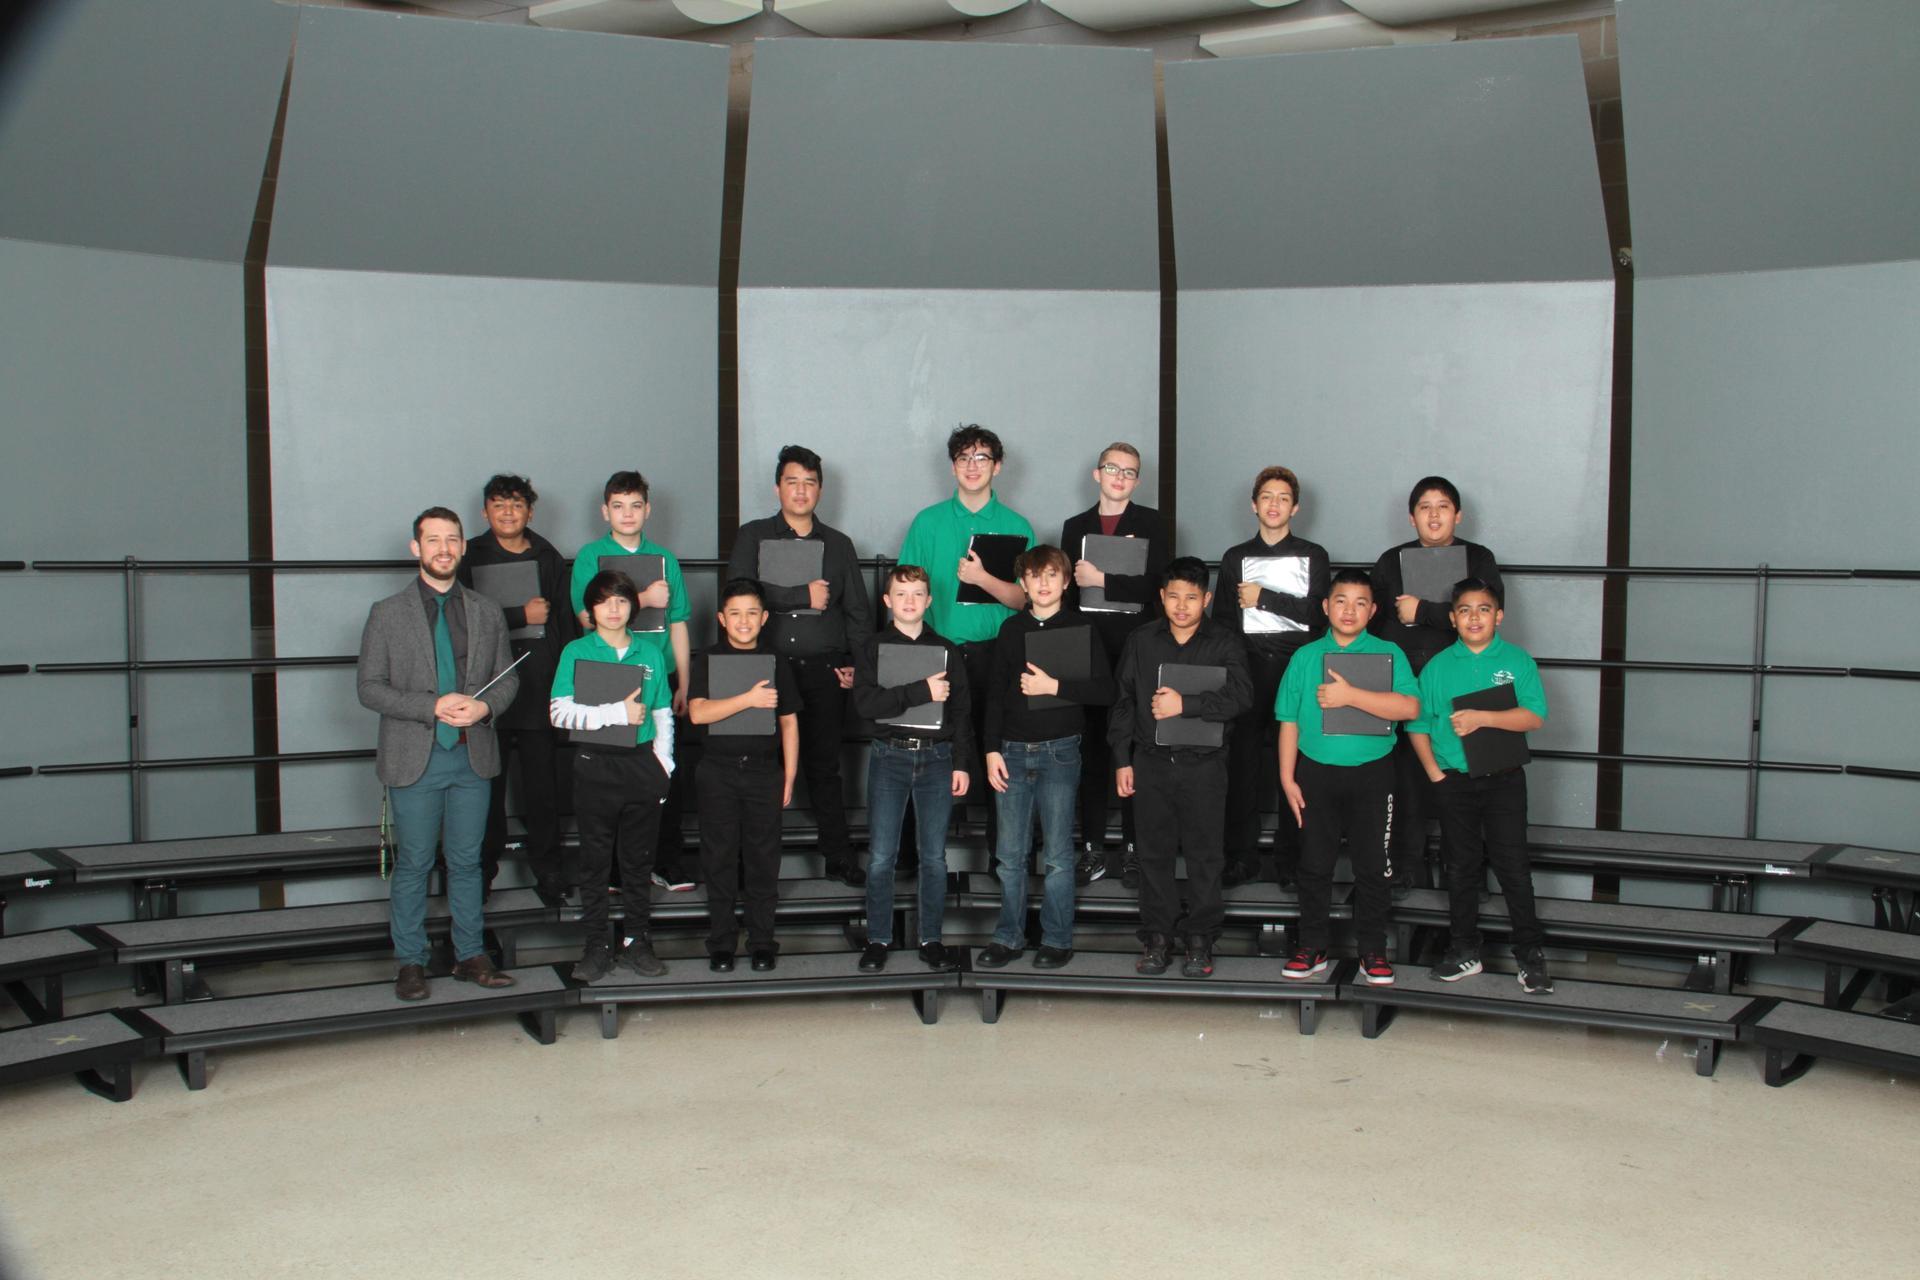 Men's Choir - X Day